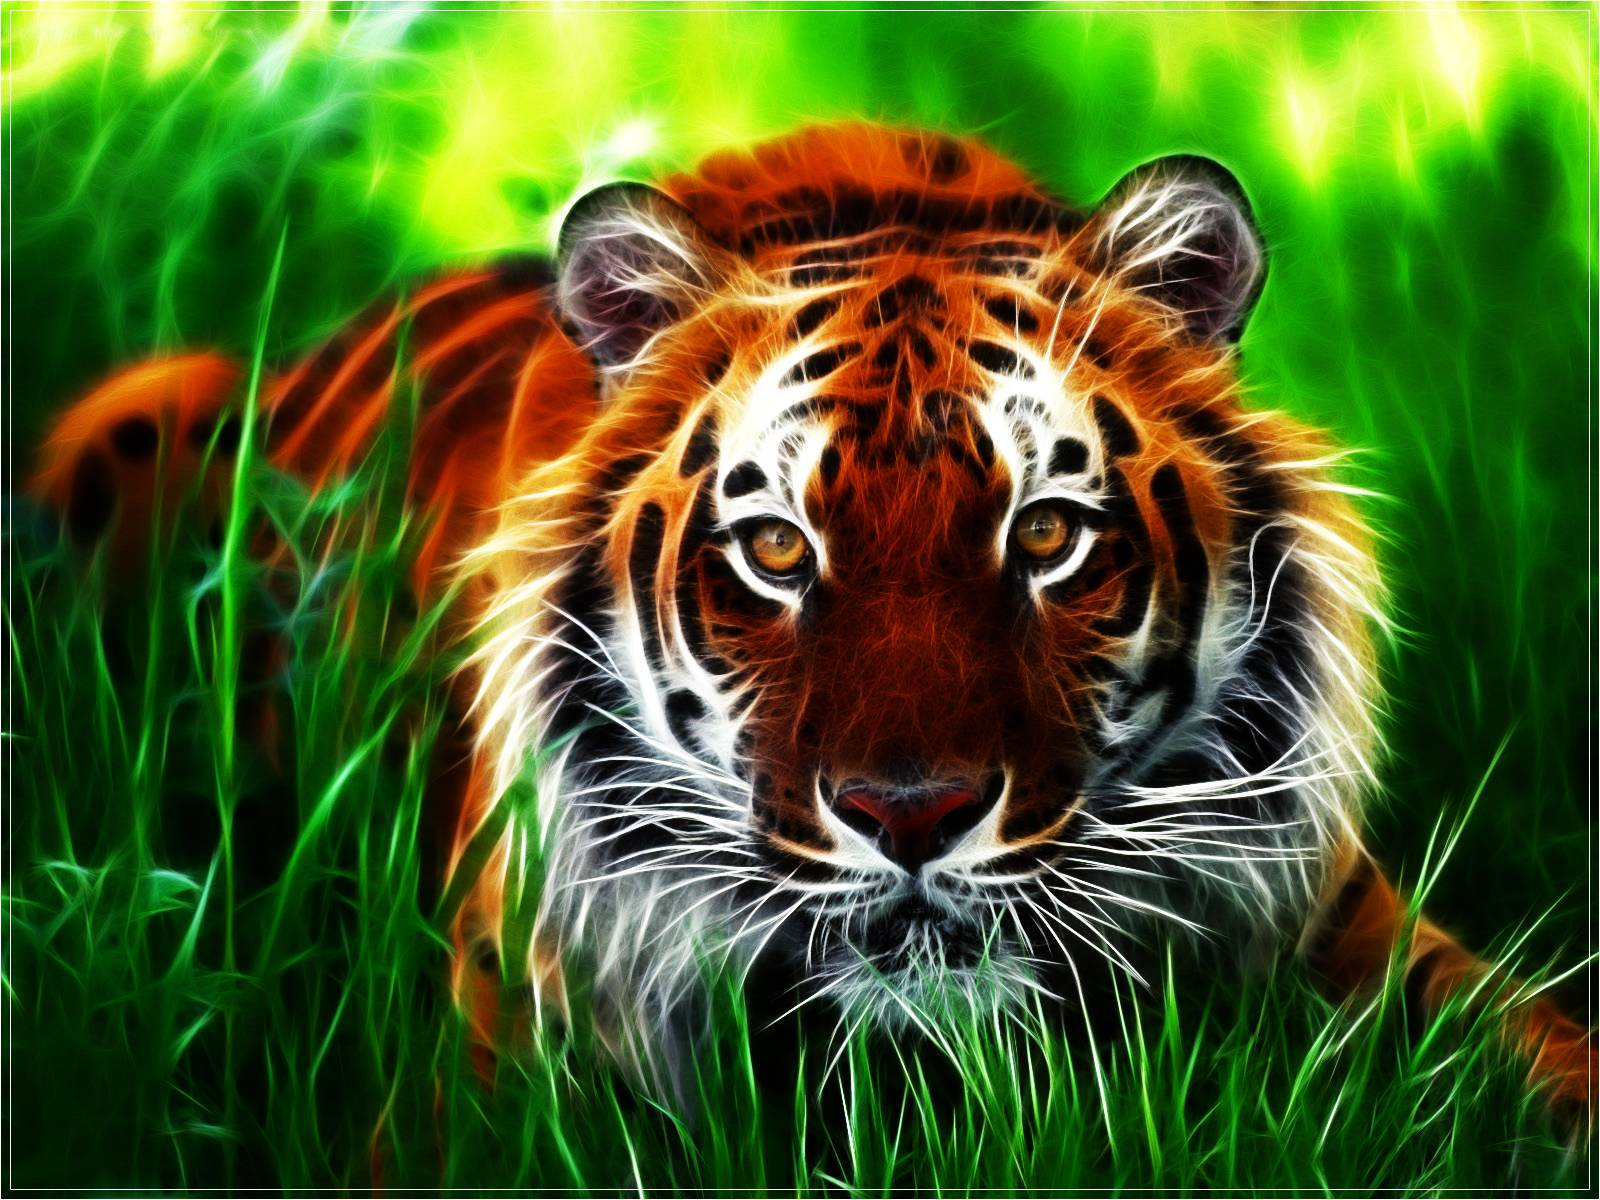 Cool Tiger Wallpapers 16001200 Download Wallpaper 1600x1200